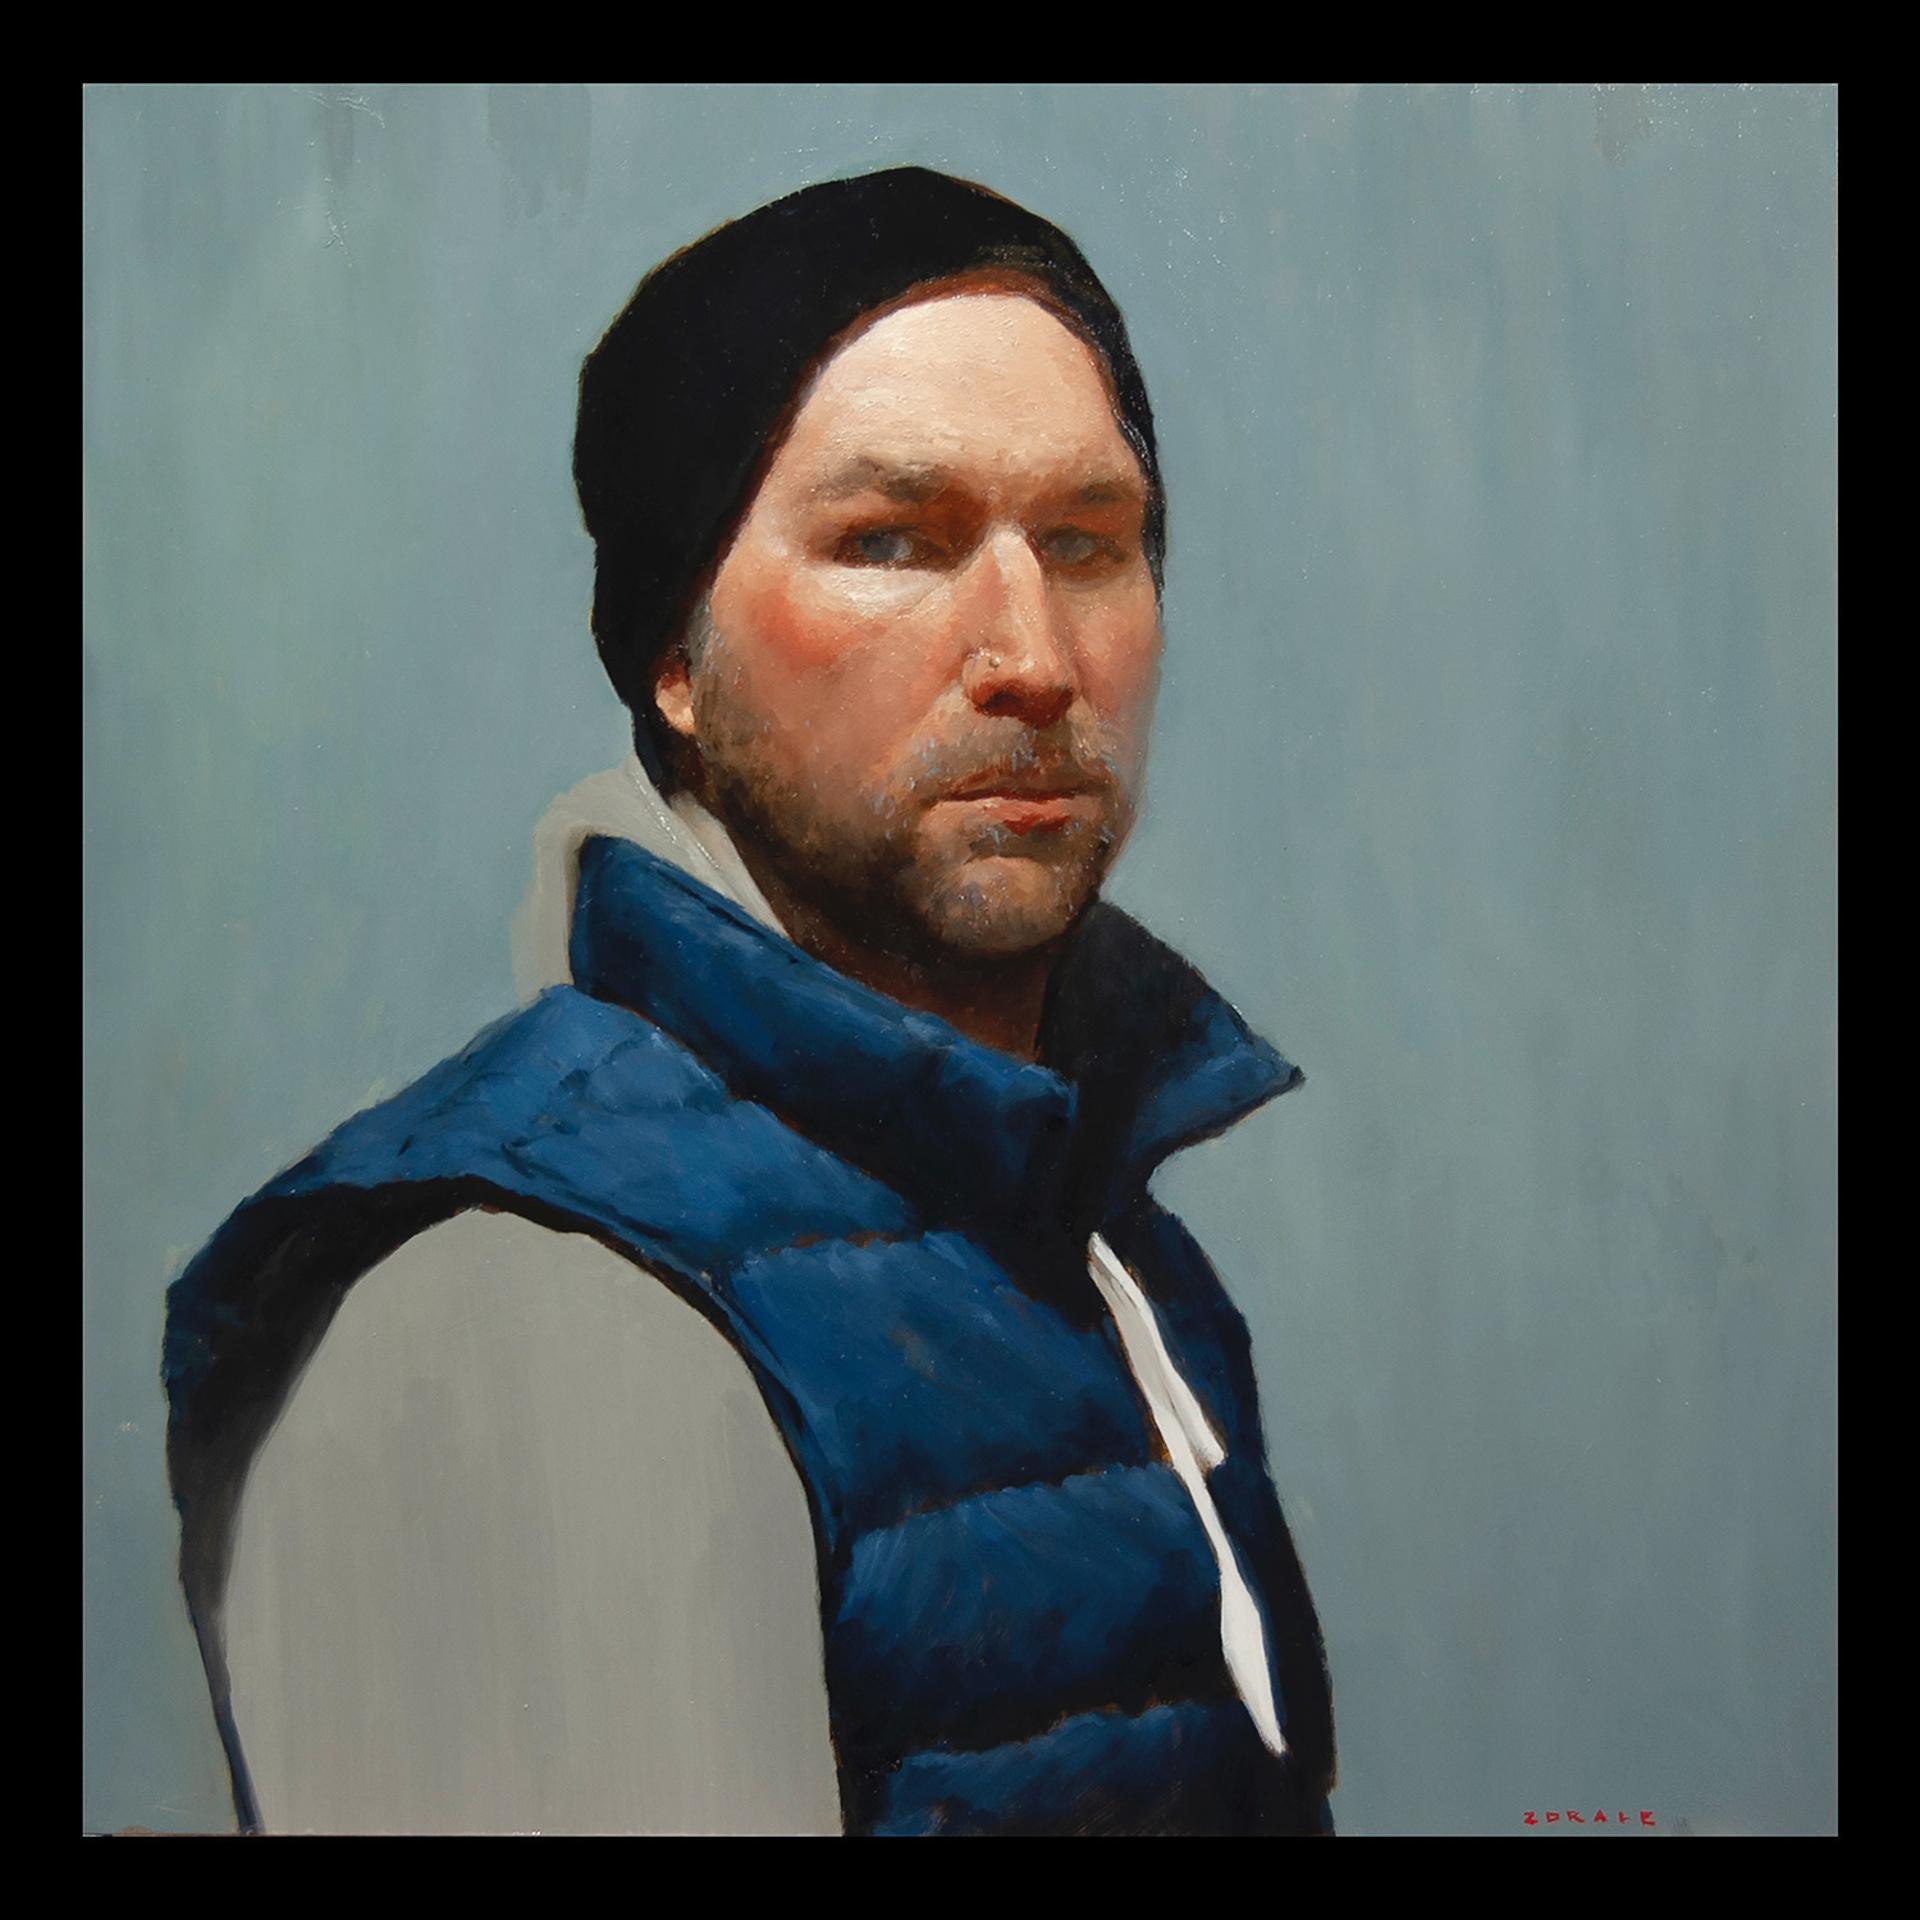 Self Portrait at 43 by Zack Zdrale